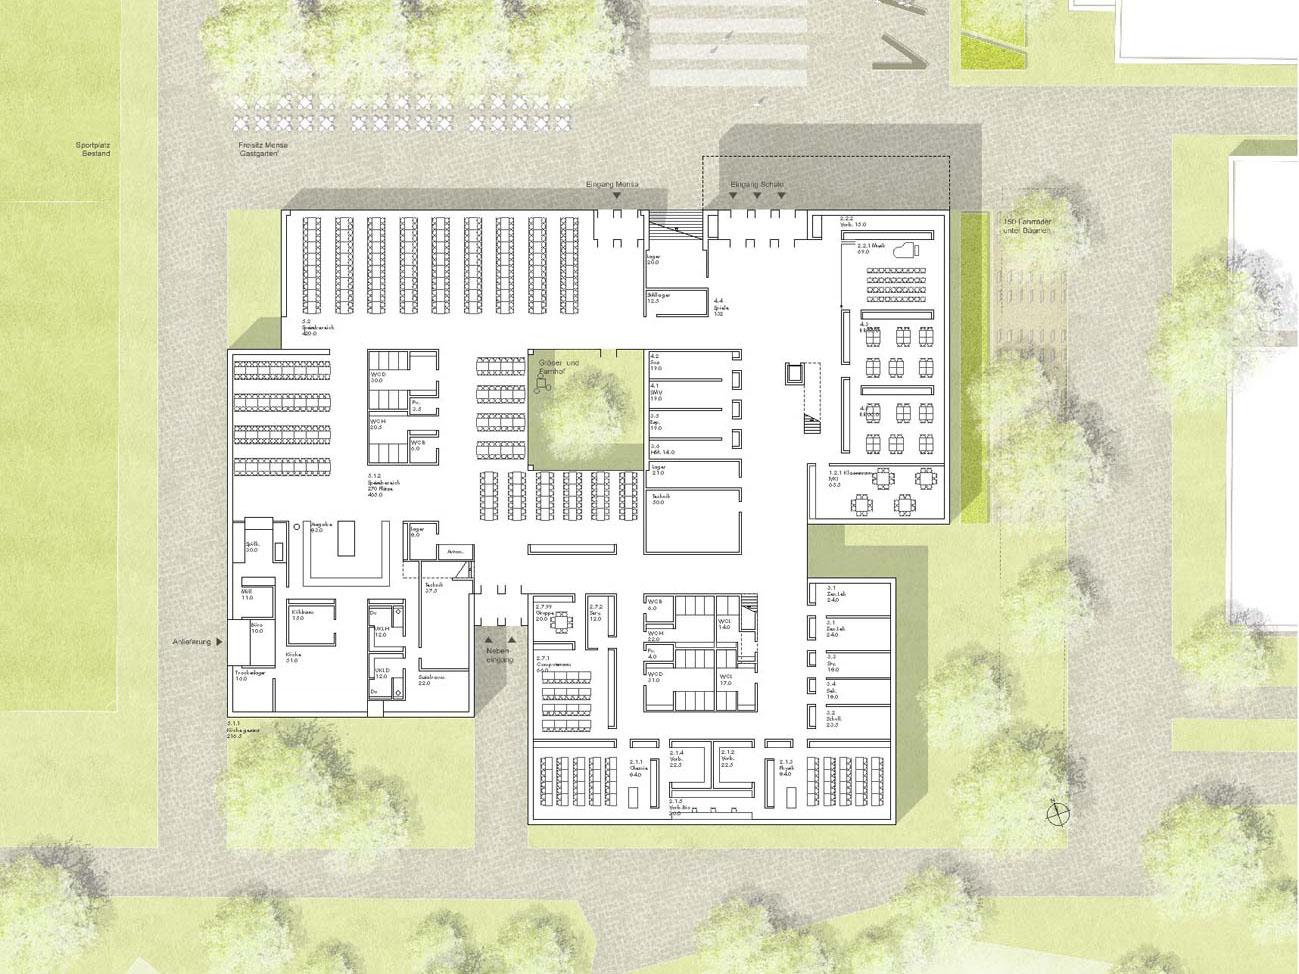 Robert boehringer gemeinschaftsschule winnenden for Stellenanzeige stadtplaner